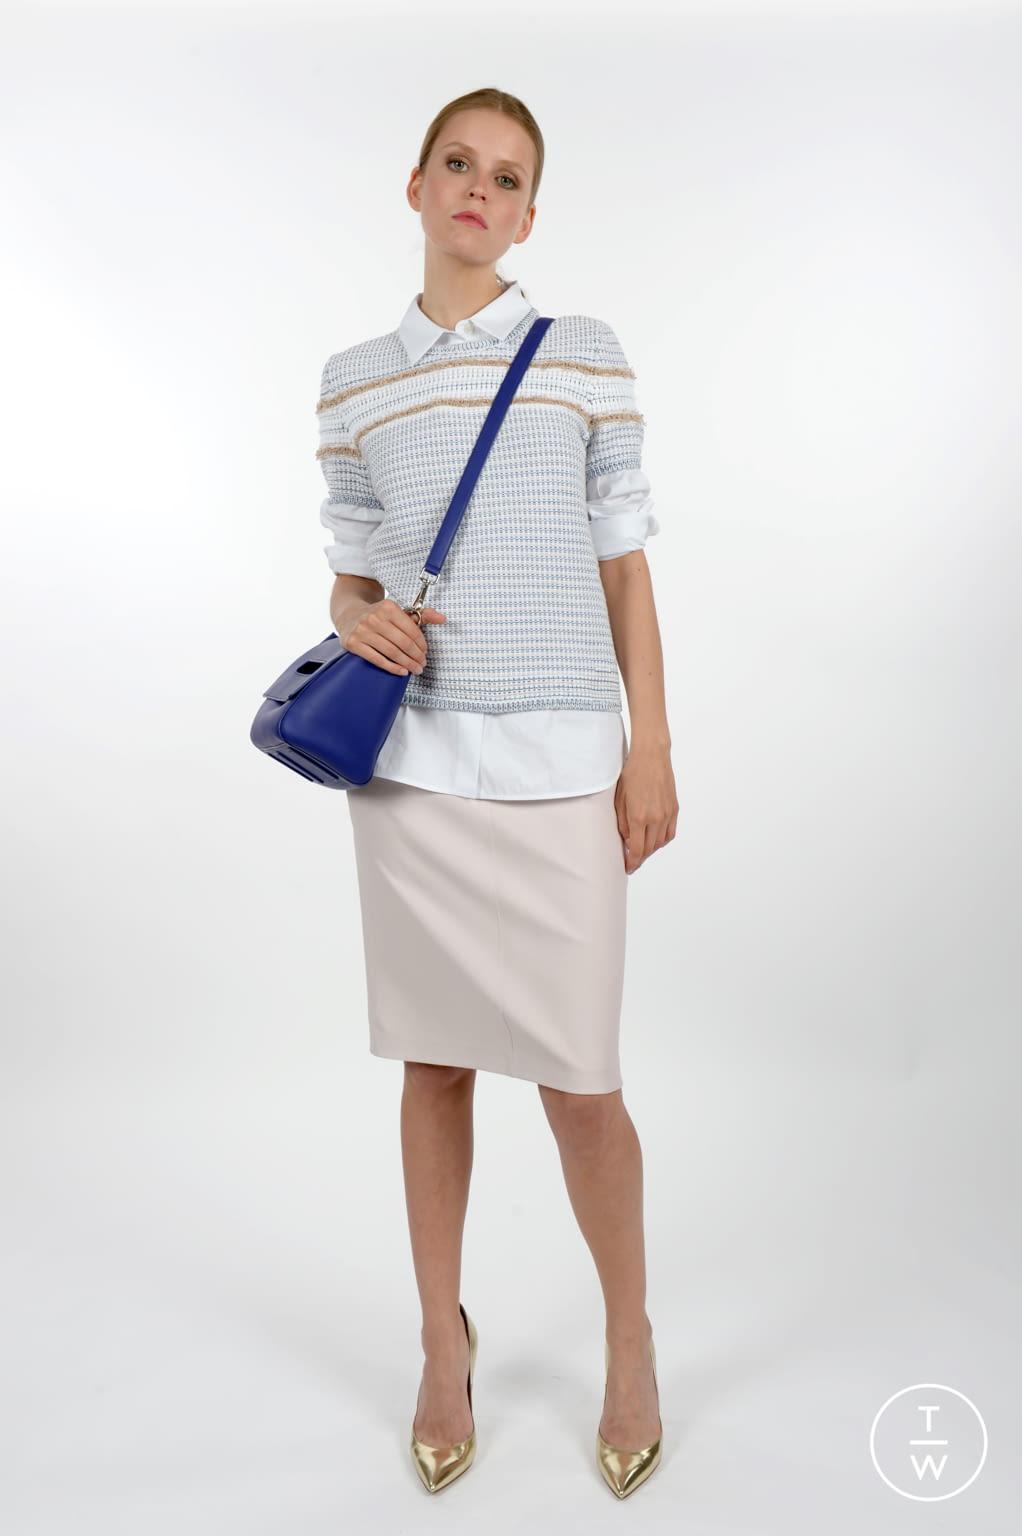 Fashion Week Paris Spring/Summer 2017 look 38 de la collection Maison Ullens womenswear